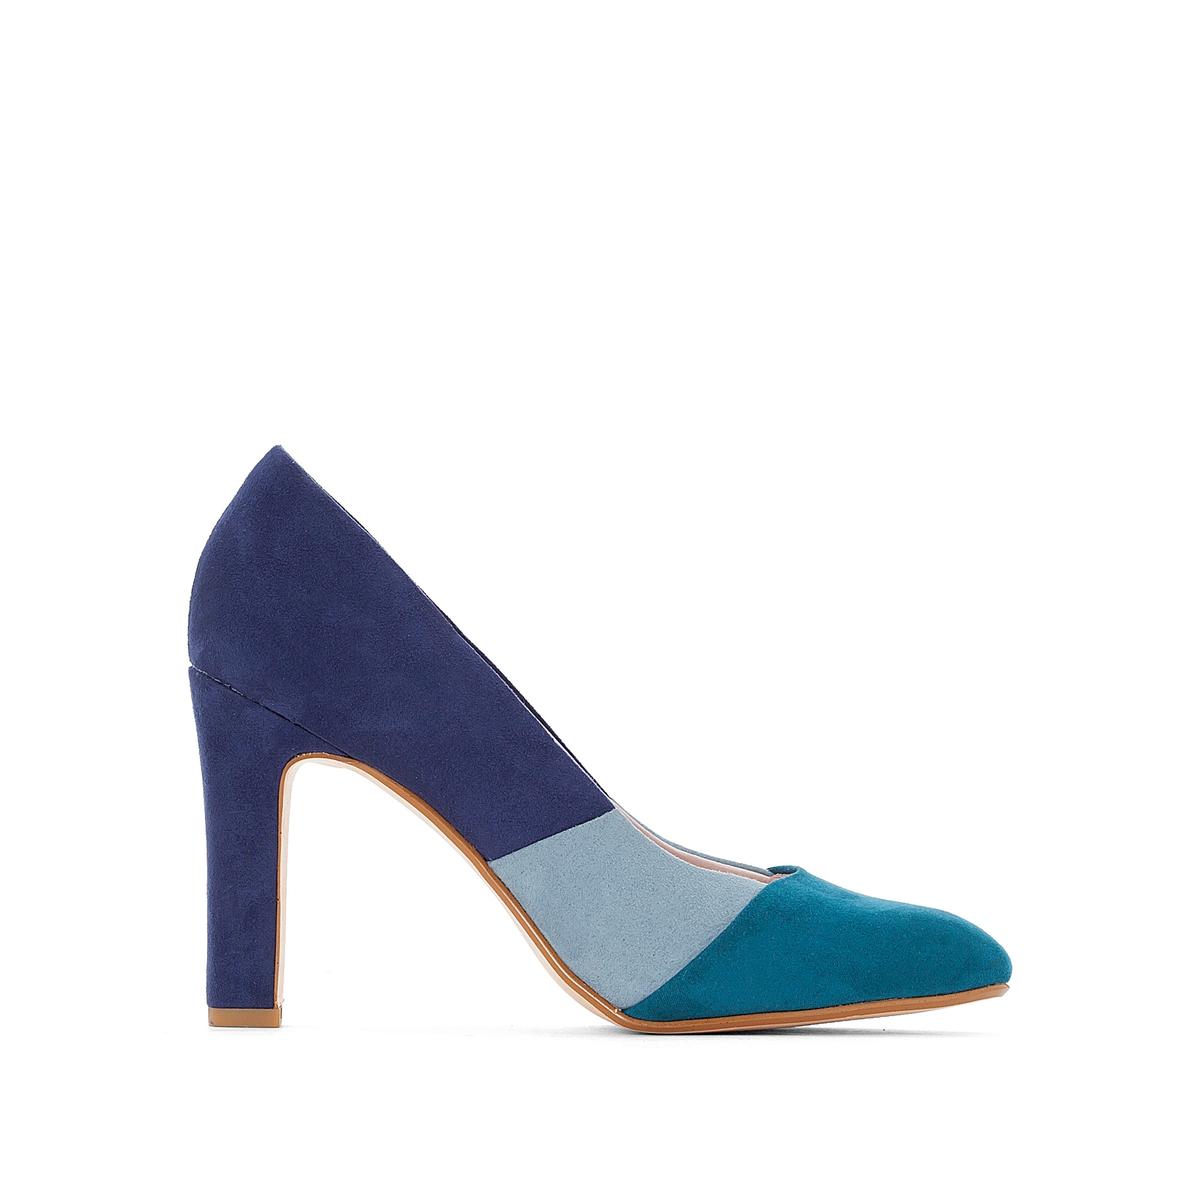 Sapatos tricolores